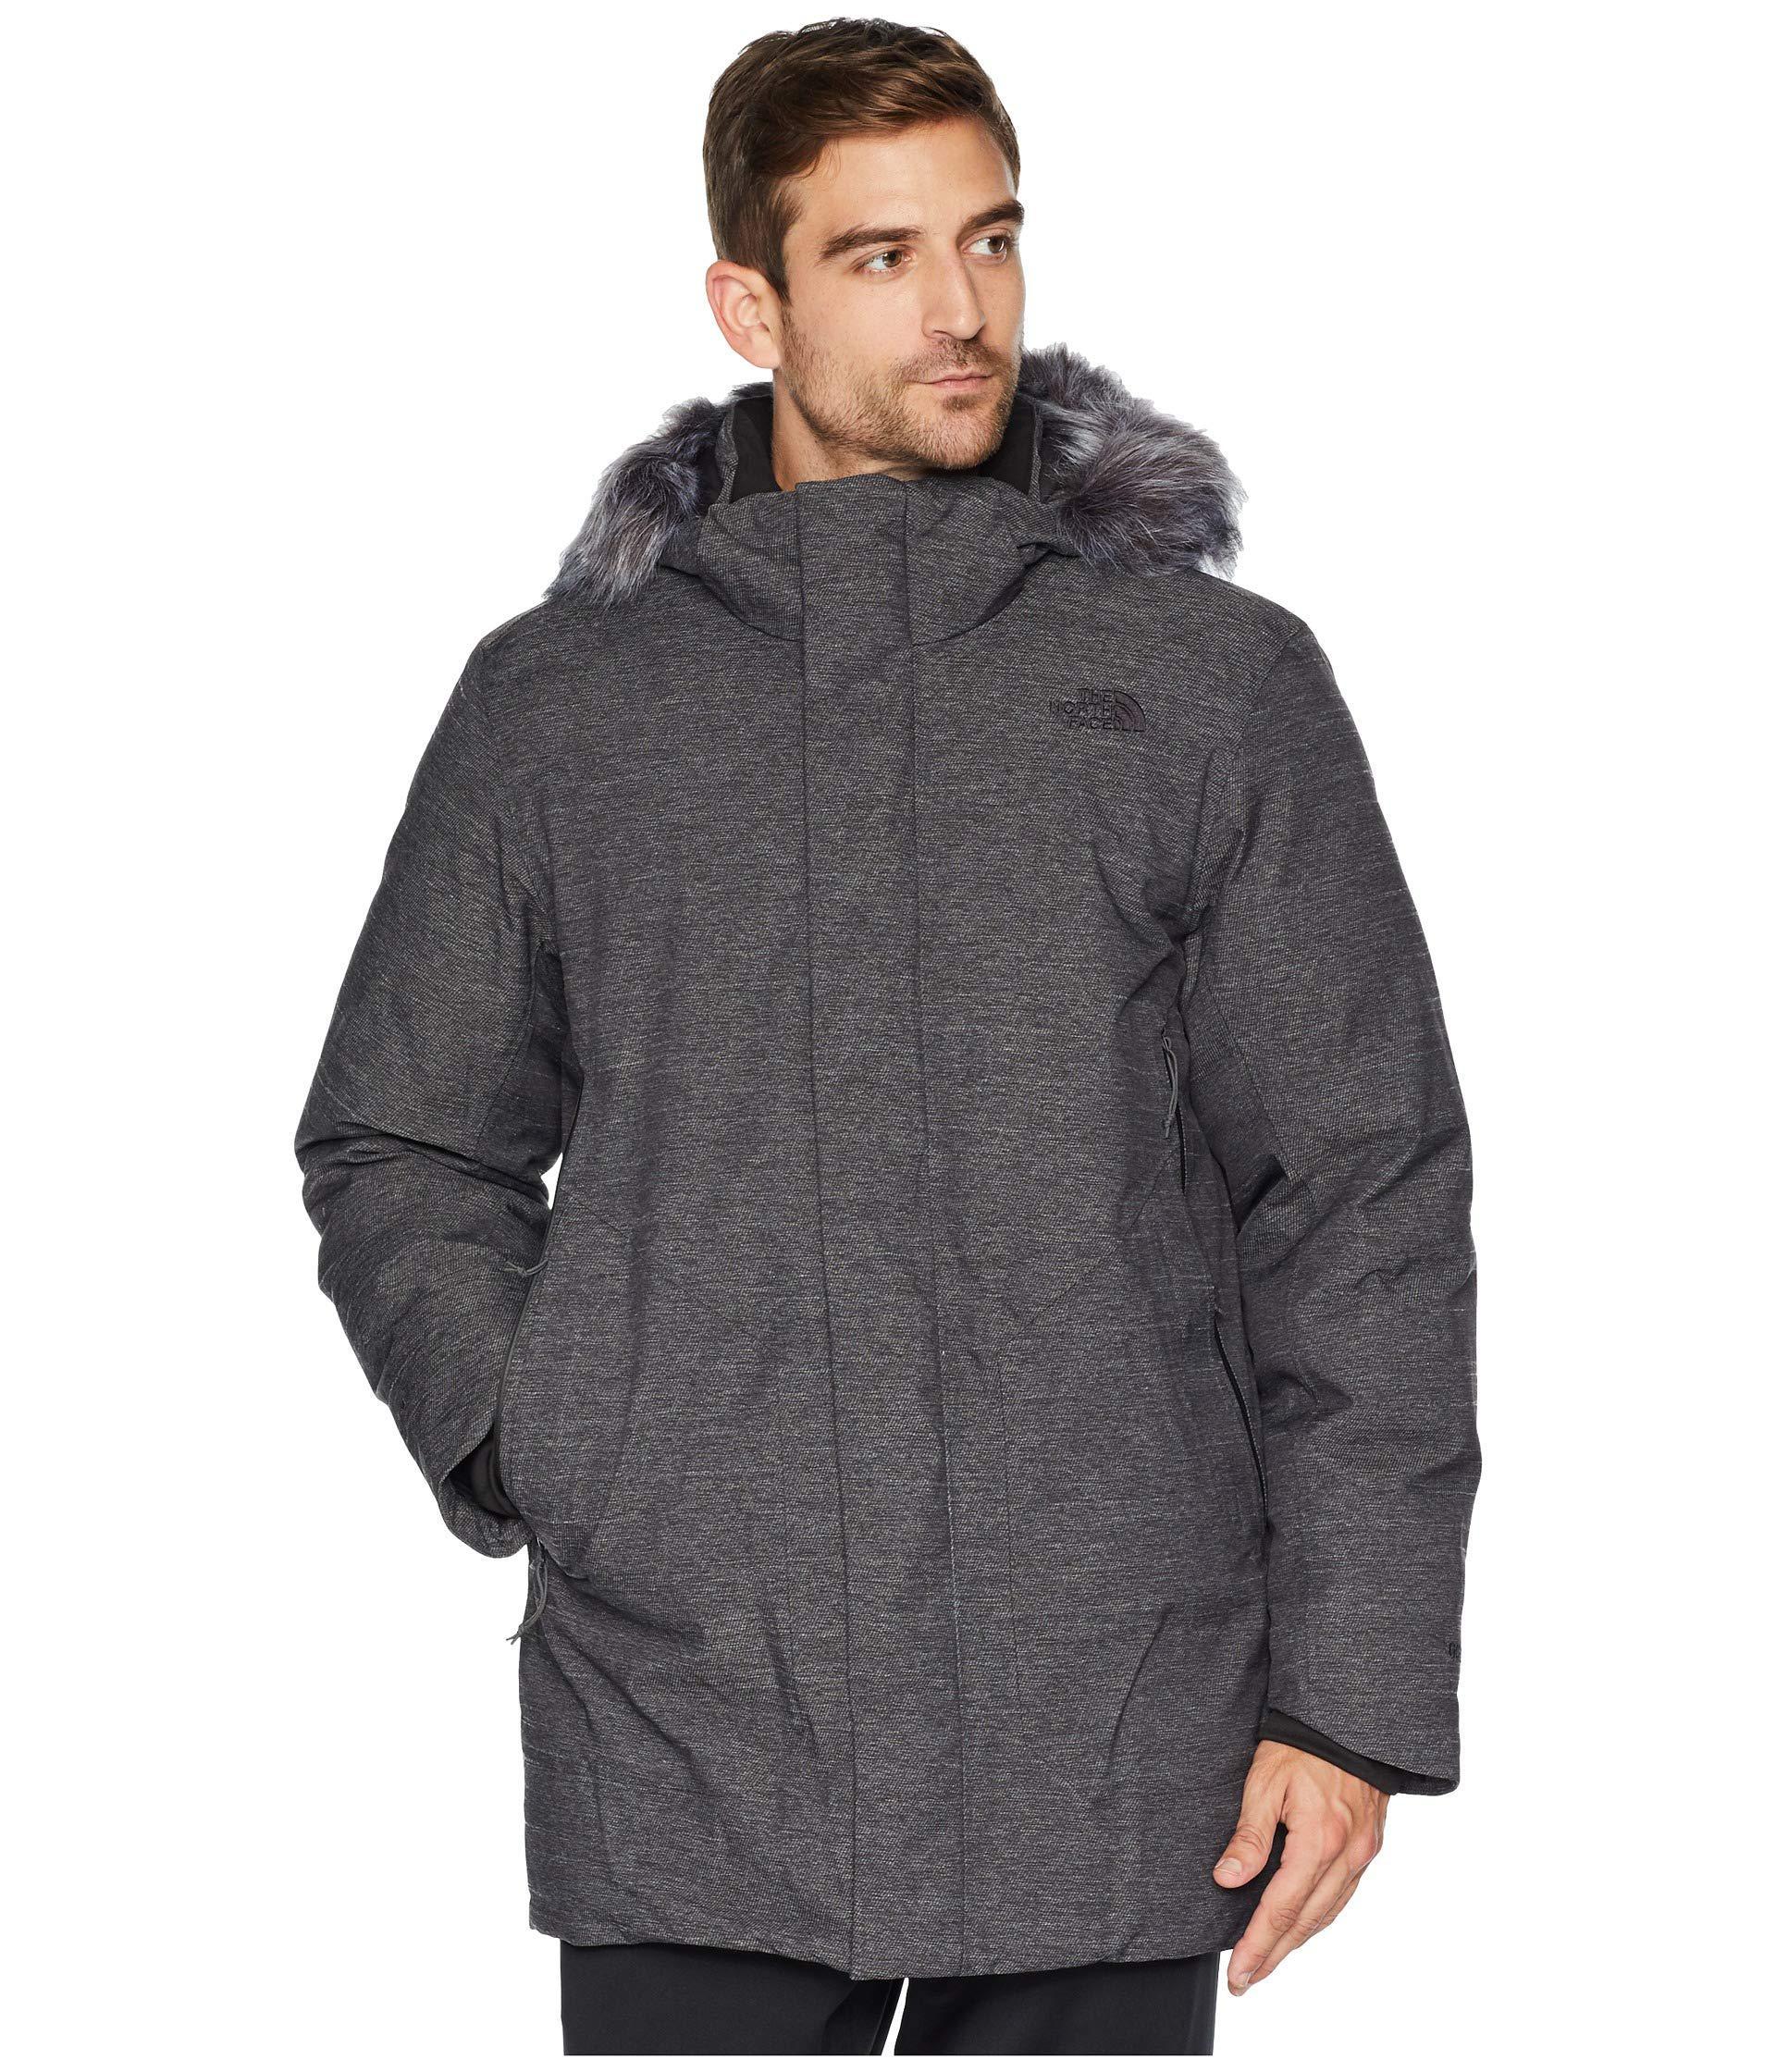 ab527684c36f3 Lyst - The North Face Defdown Parka Gtx (urban Navy) Men s Coat in ...